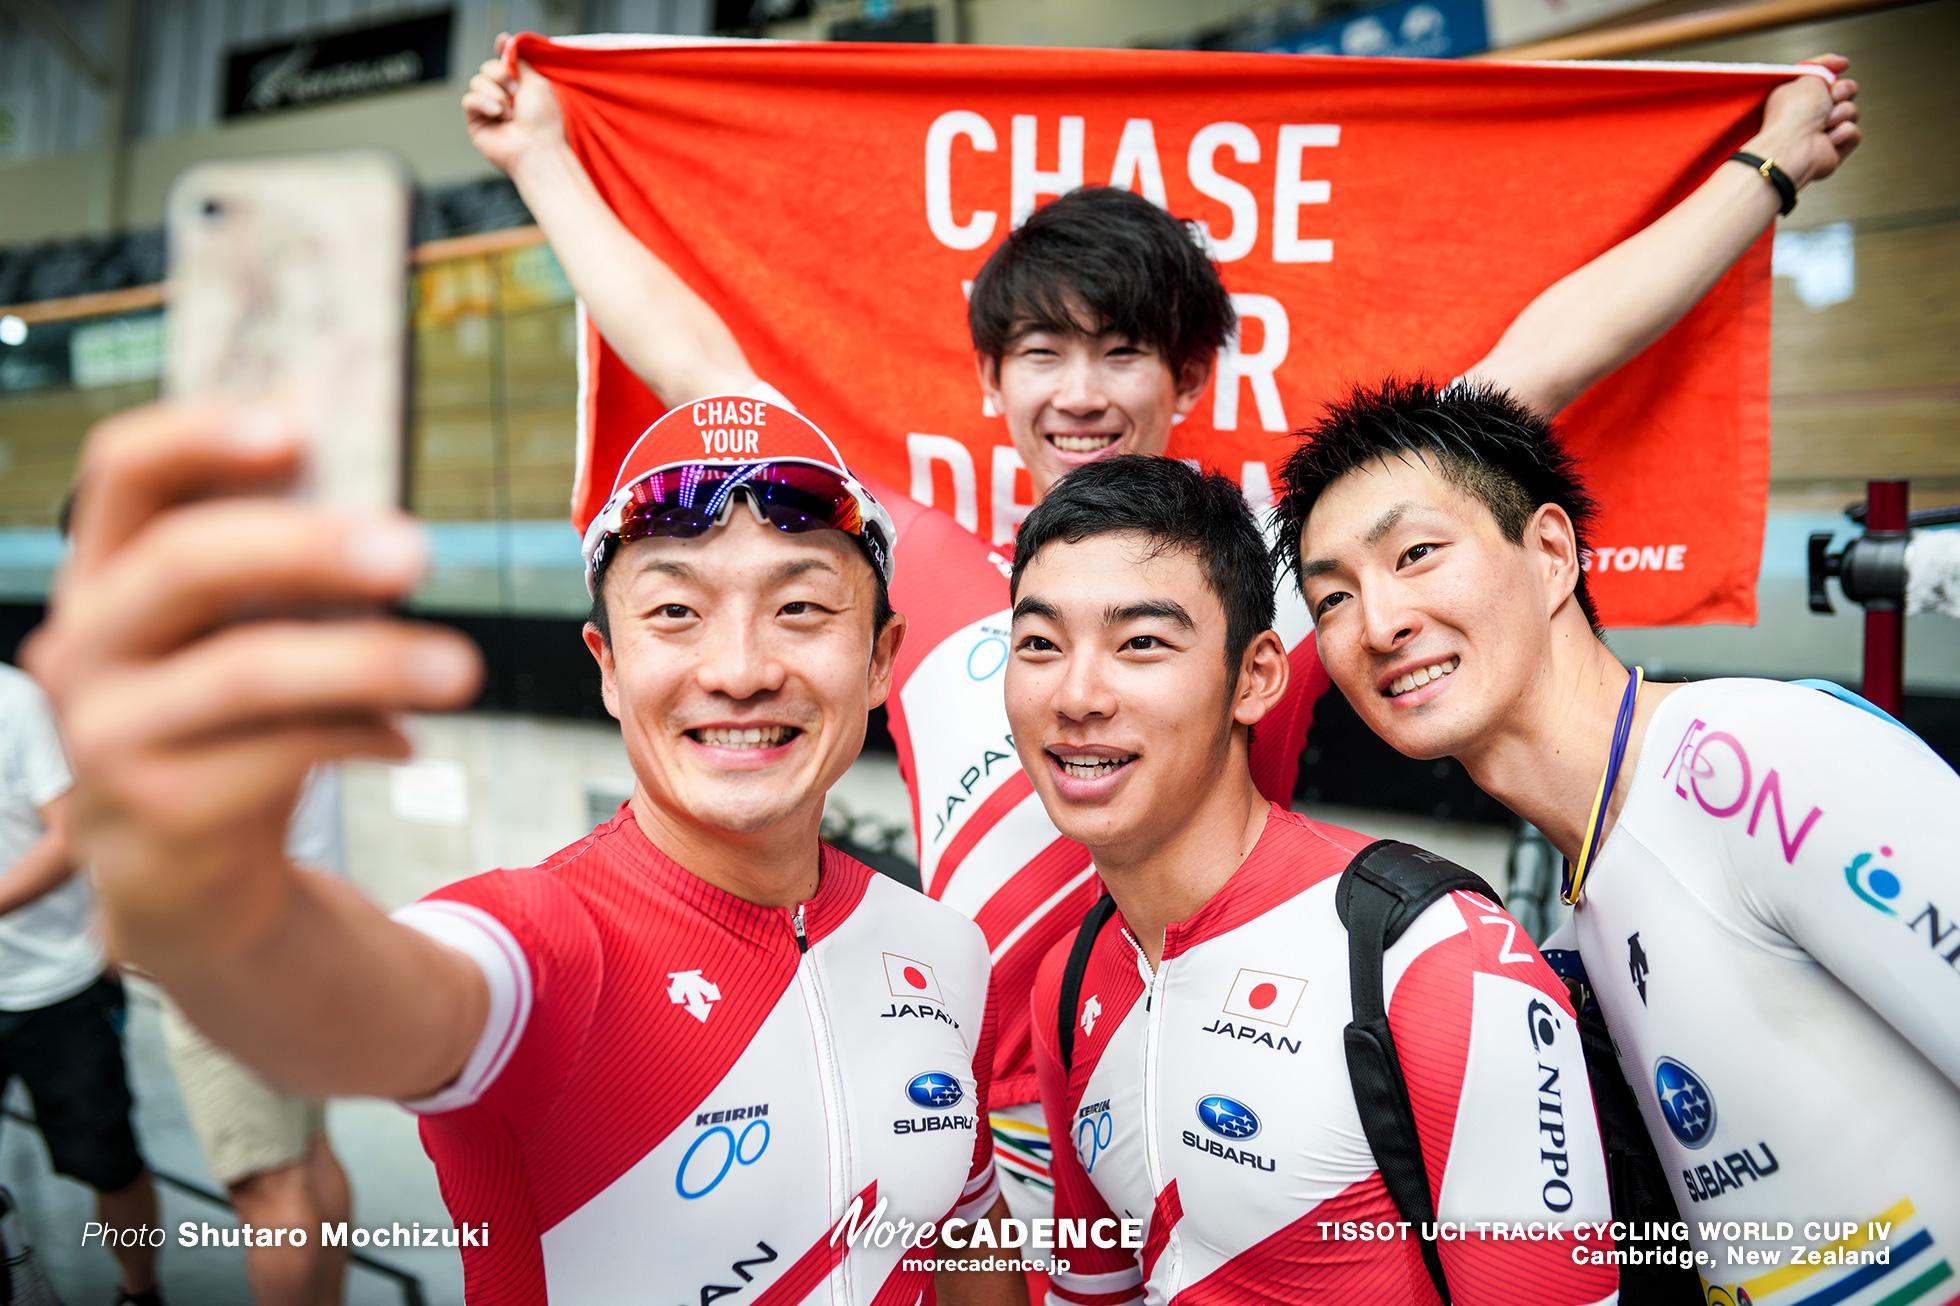 Qualifying / Men's Team Pursuit / TISSOT UCI TRACK CYCLING WORLD CUP IV, Cambridge, New Zealand, 沢田桂太郎 窪木一茂 今村駿介 近谷涼